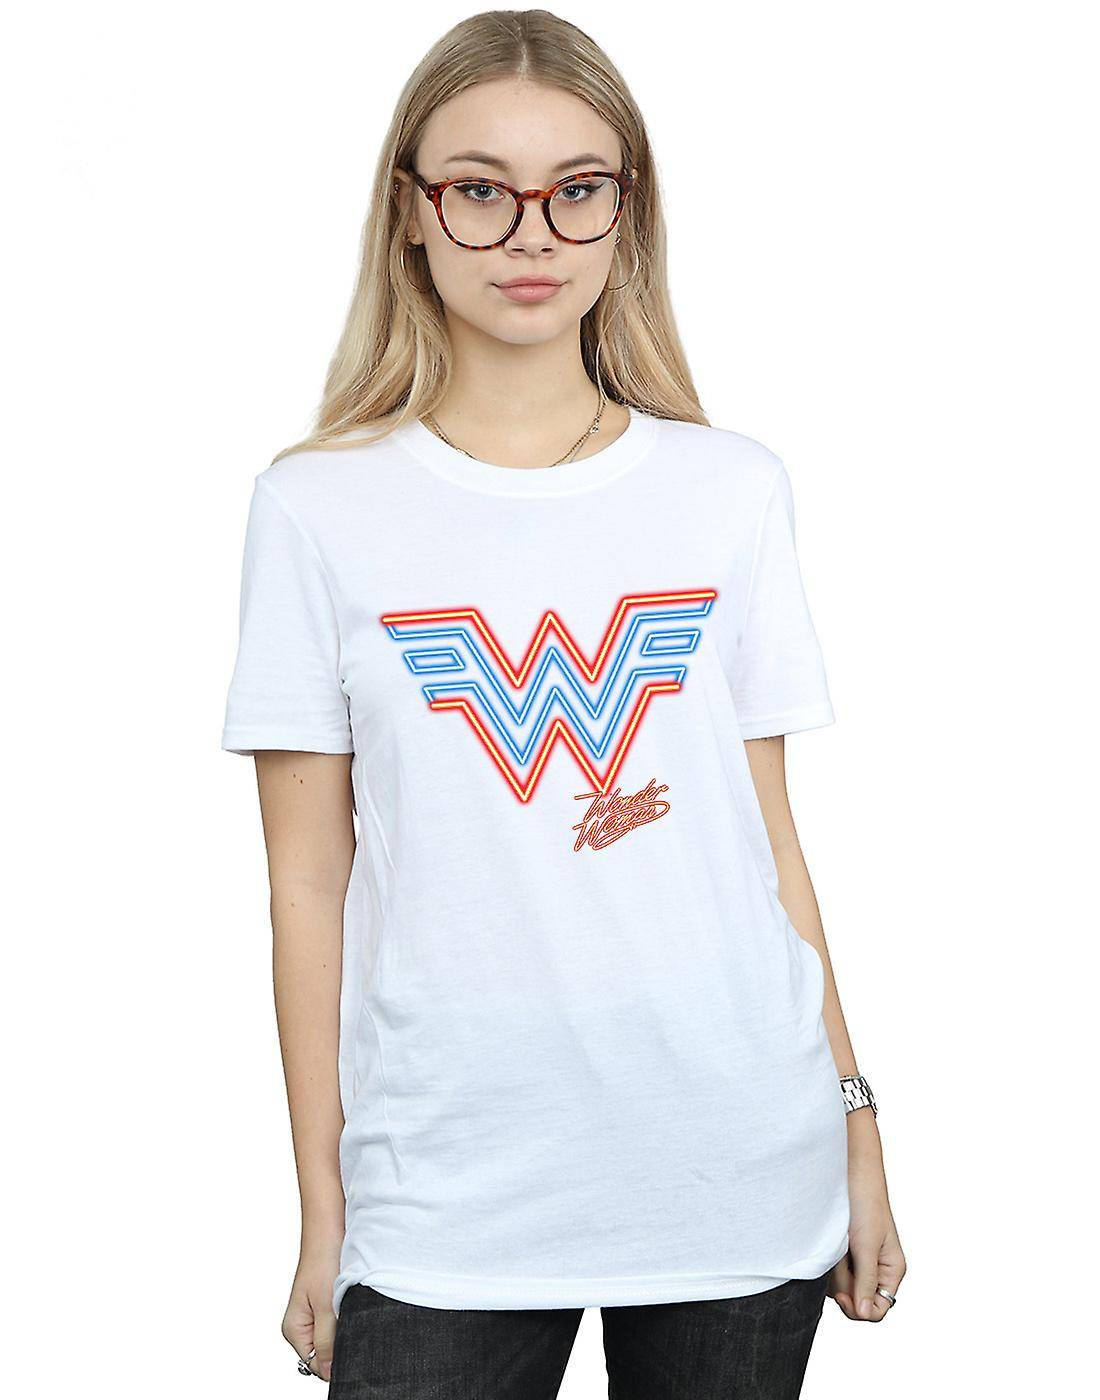 Absolute Cult DC Comics Femmes-apos;s Wonder Woman 84 Neon Emblem Boyfriend Fit T-Shirt Noir Small